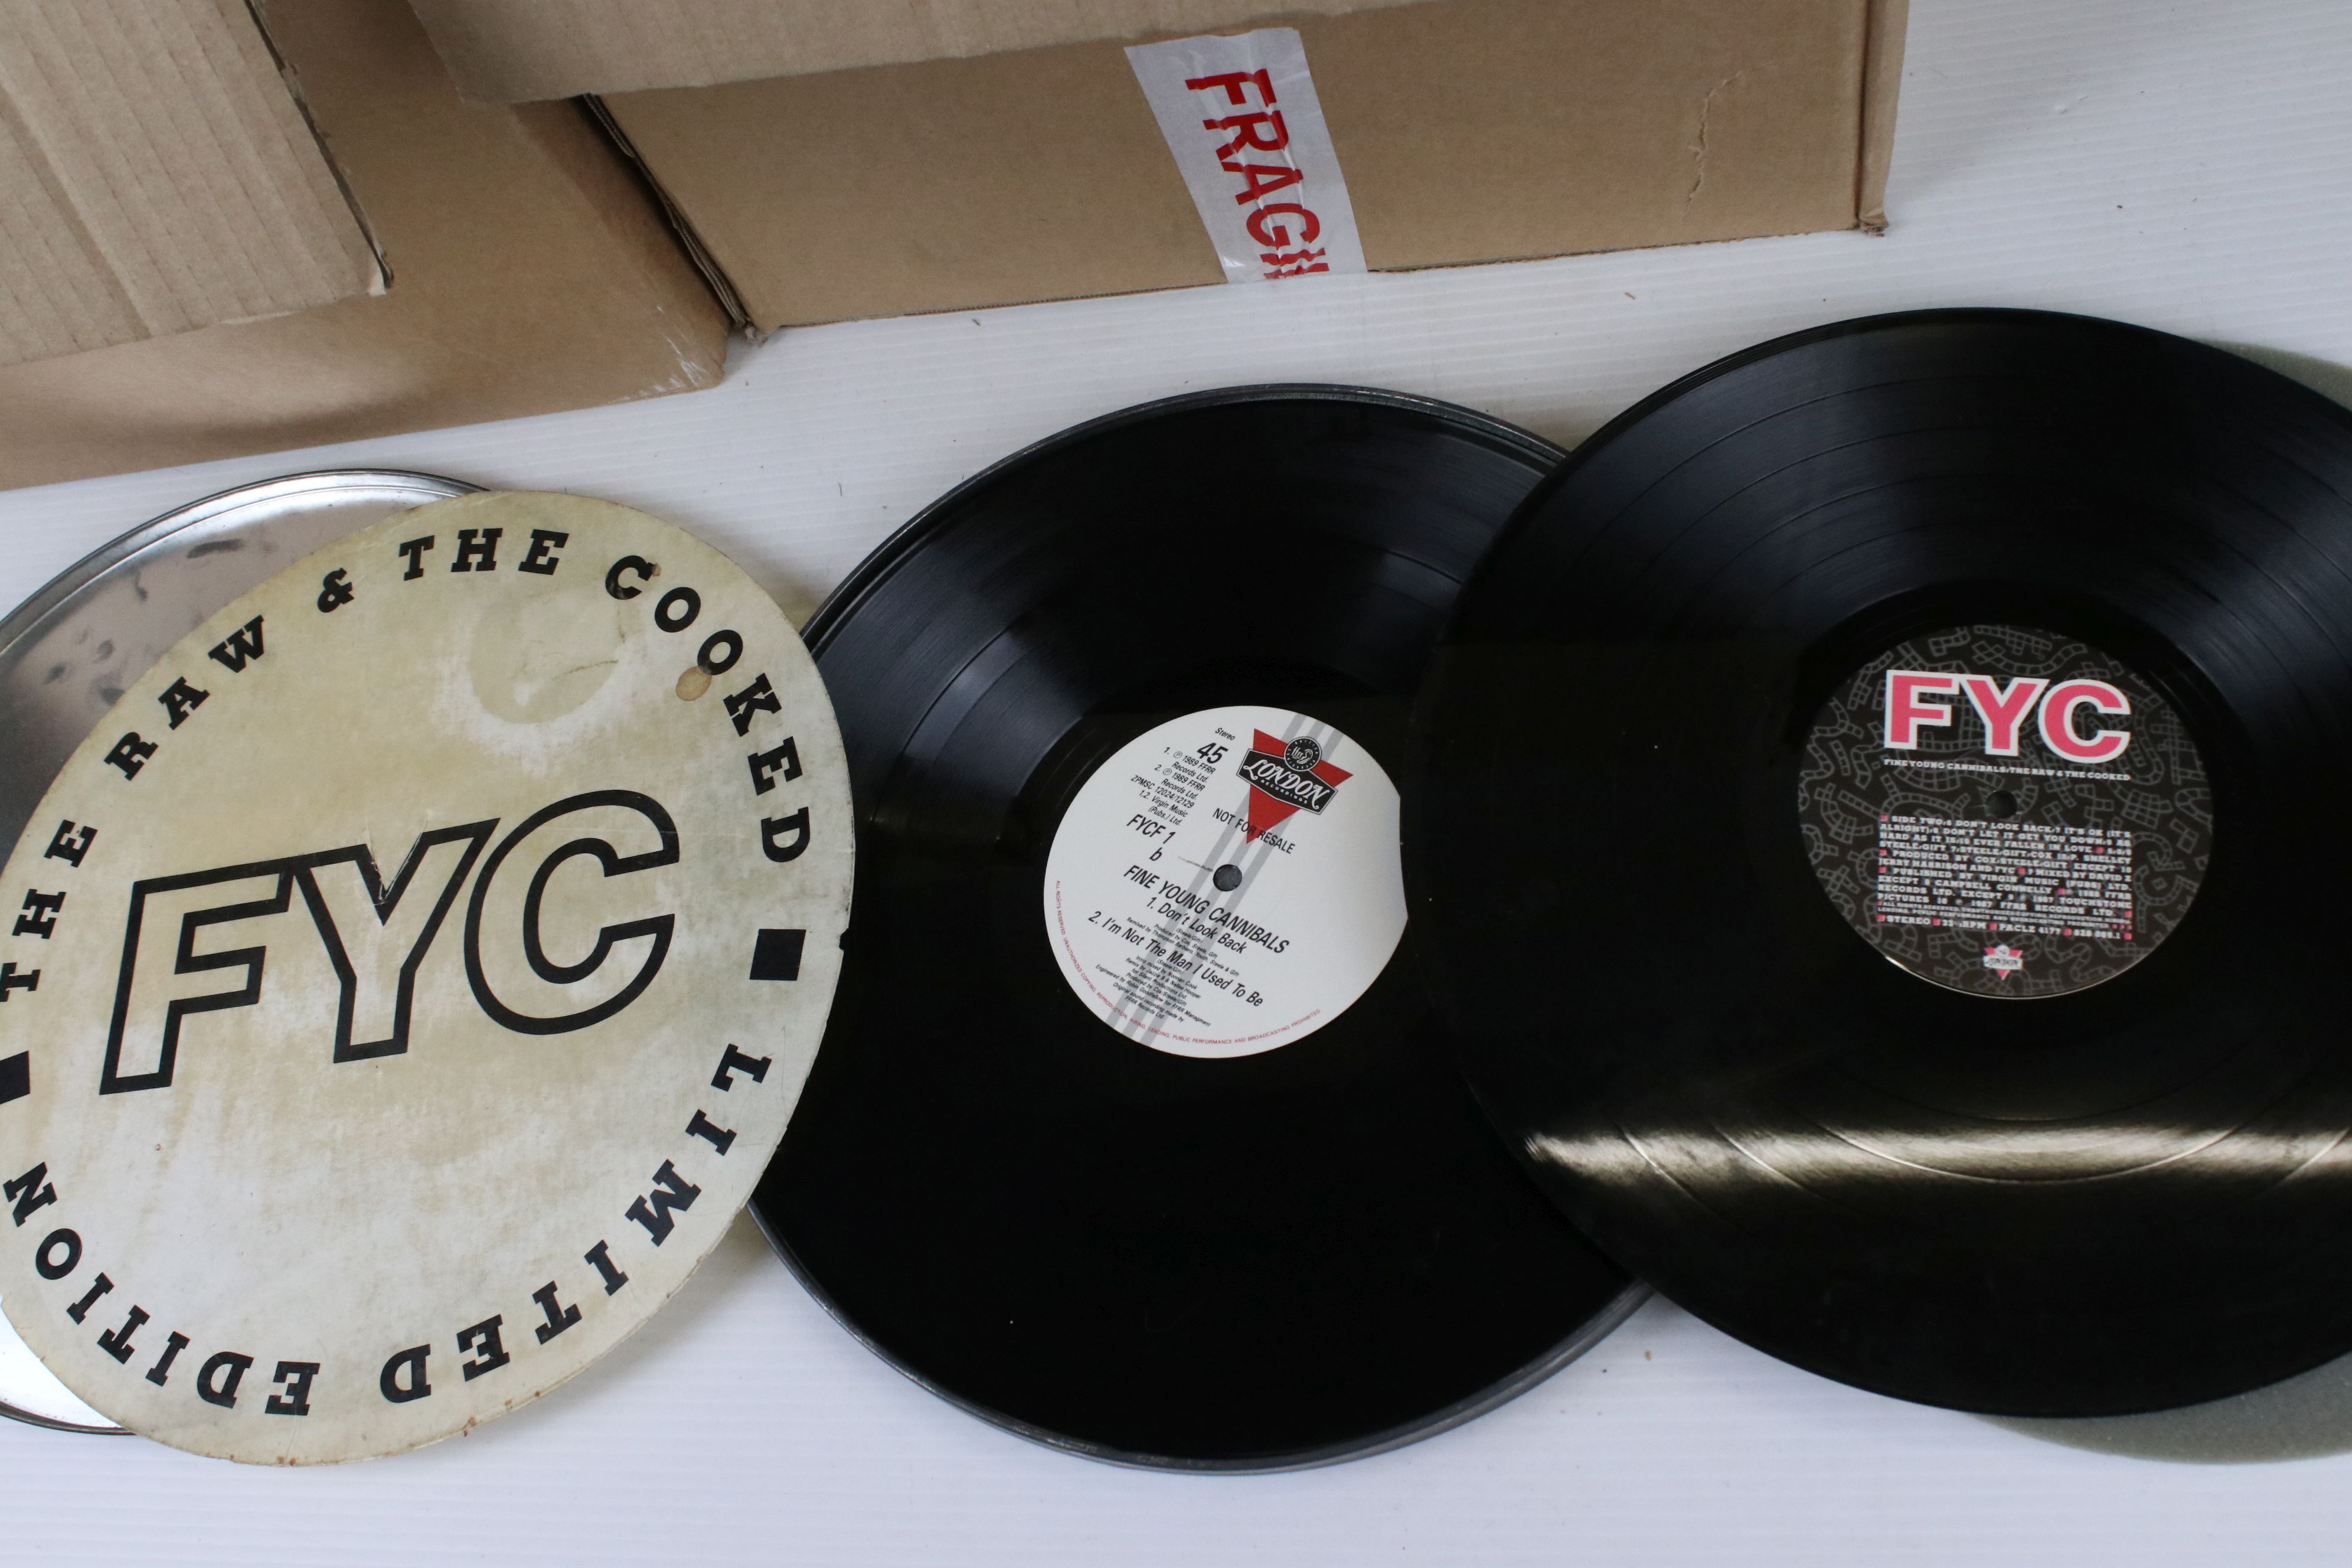 Vinyl - Approx 150 Rock & Pop LP's including Elton John, Fine Young Cannibals, Roxy Music, Sad Cafe, - Image 4 of 5